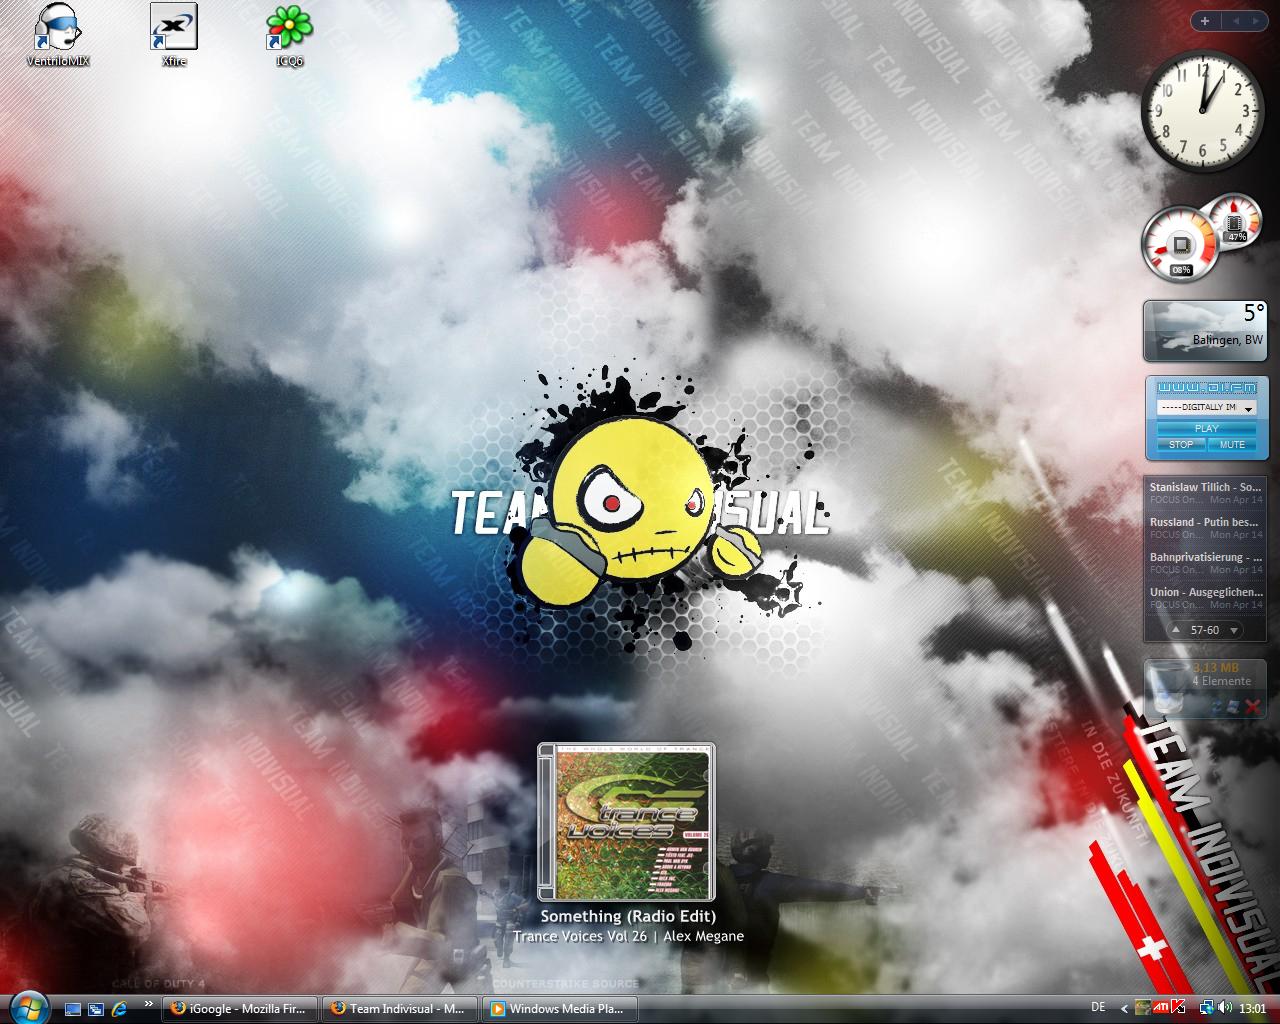 PIIIII's Desktop Screen by Pired1992